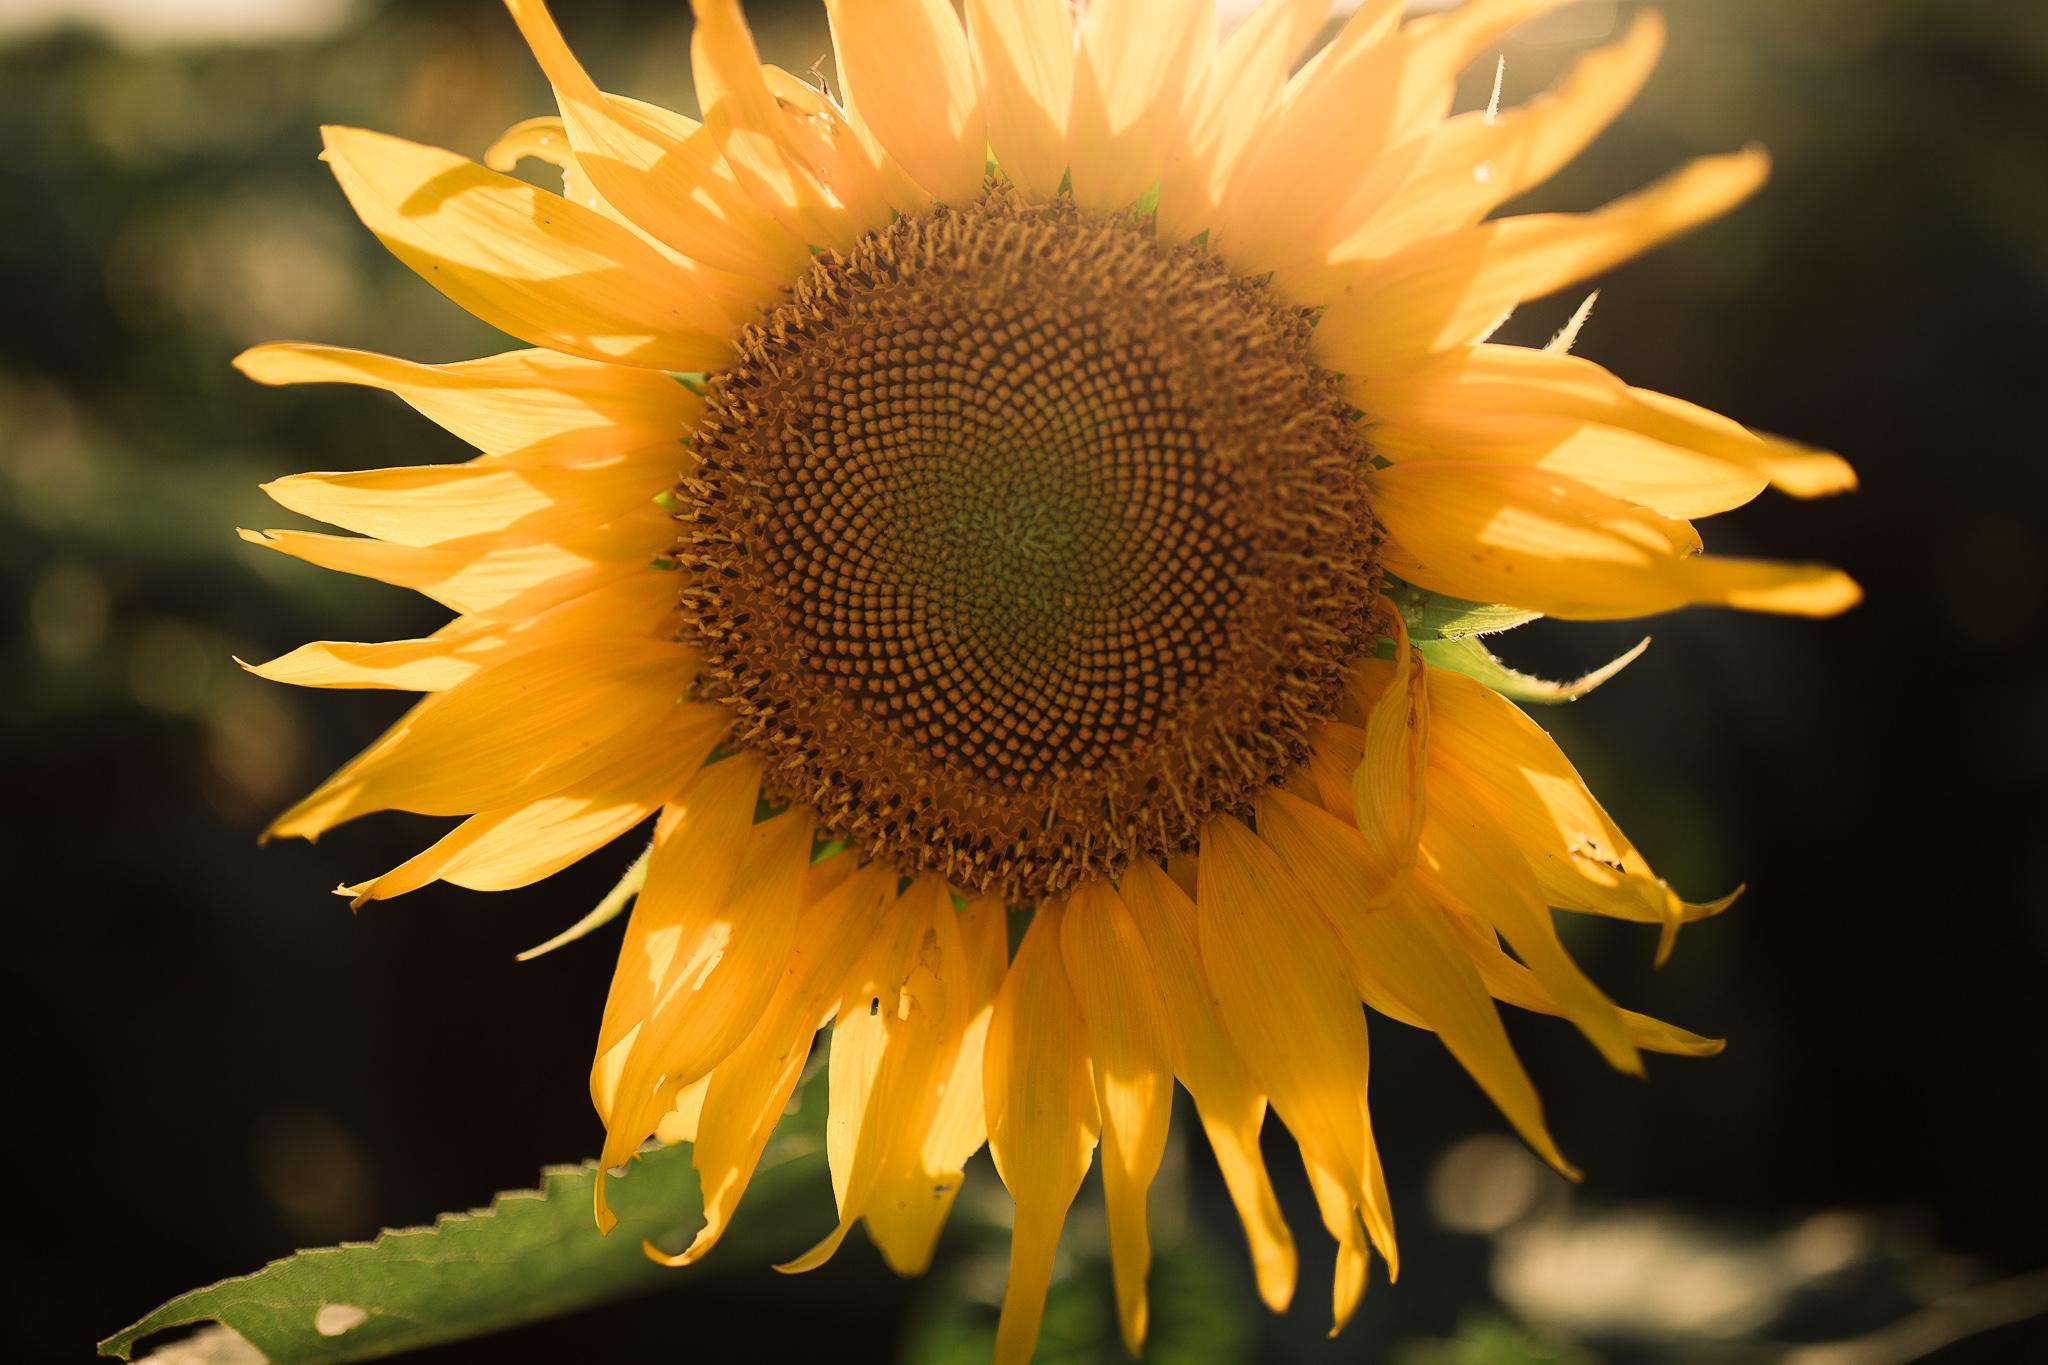 memphis-wedding-photographer-senior-portraits-shelby-farms-sunflower-field